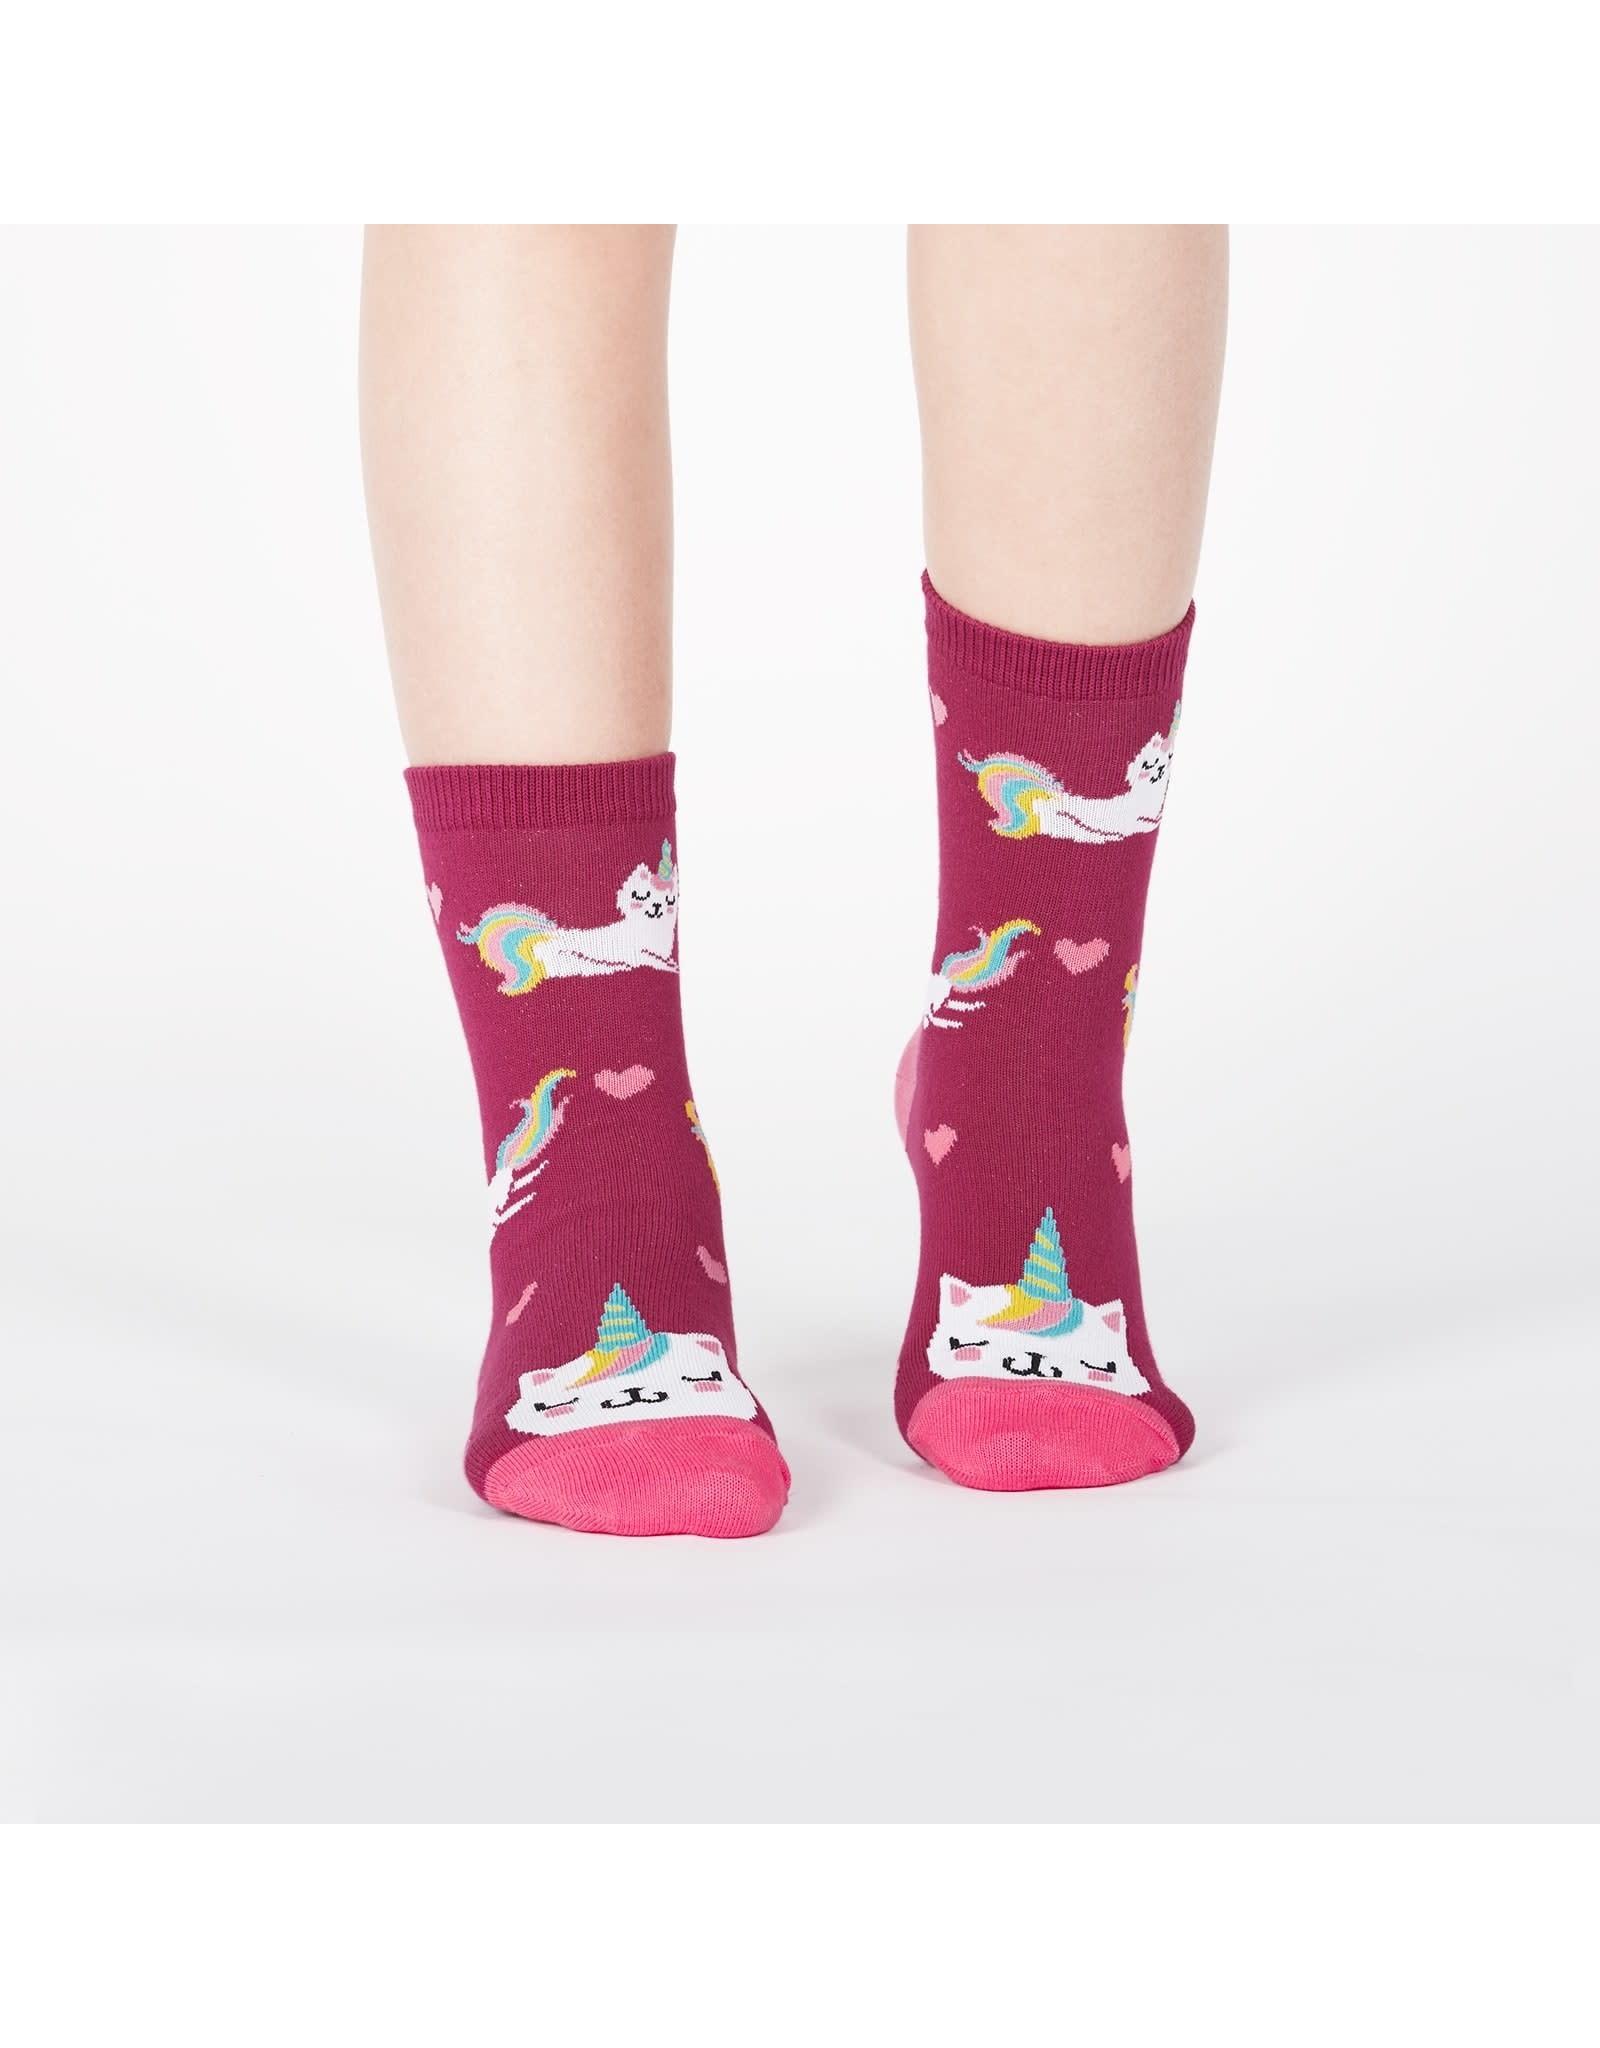 SOCK IT TO ME - Junior Look At Me Meow Crew Socks